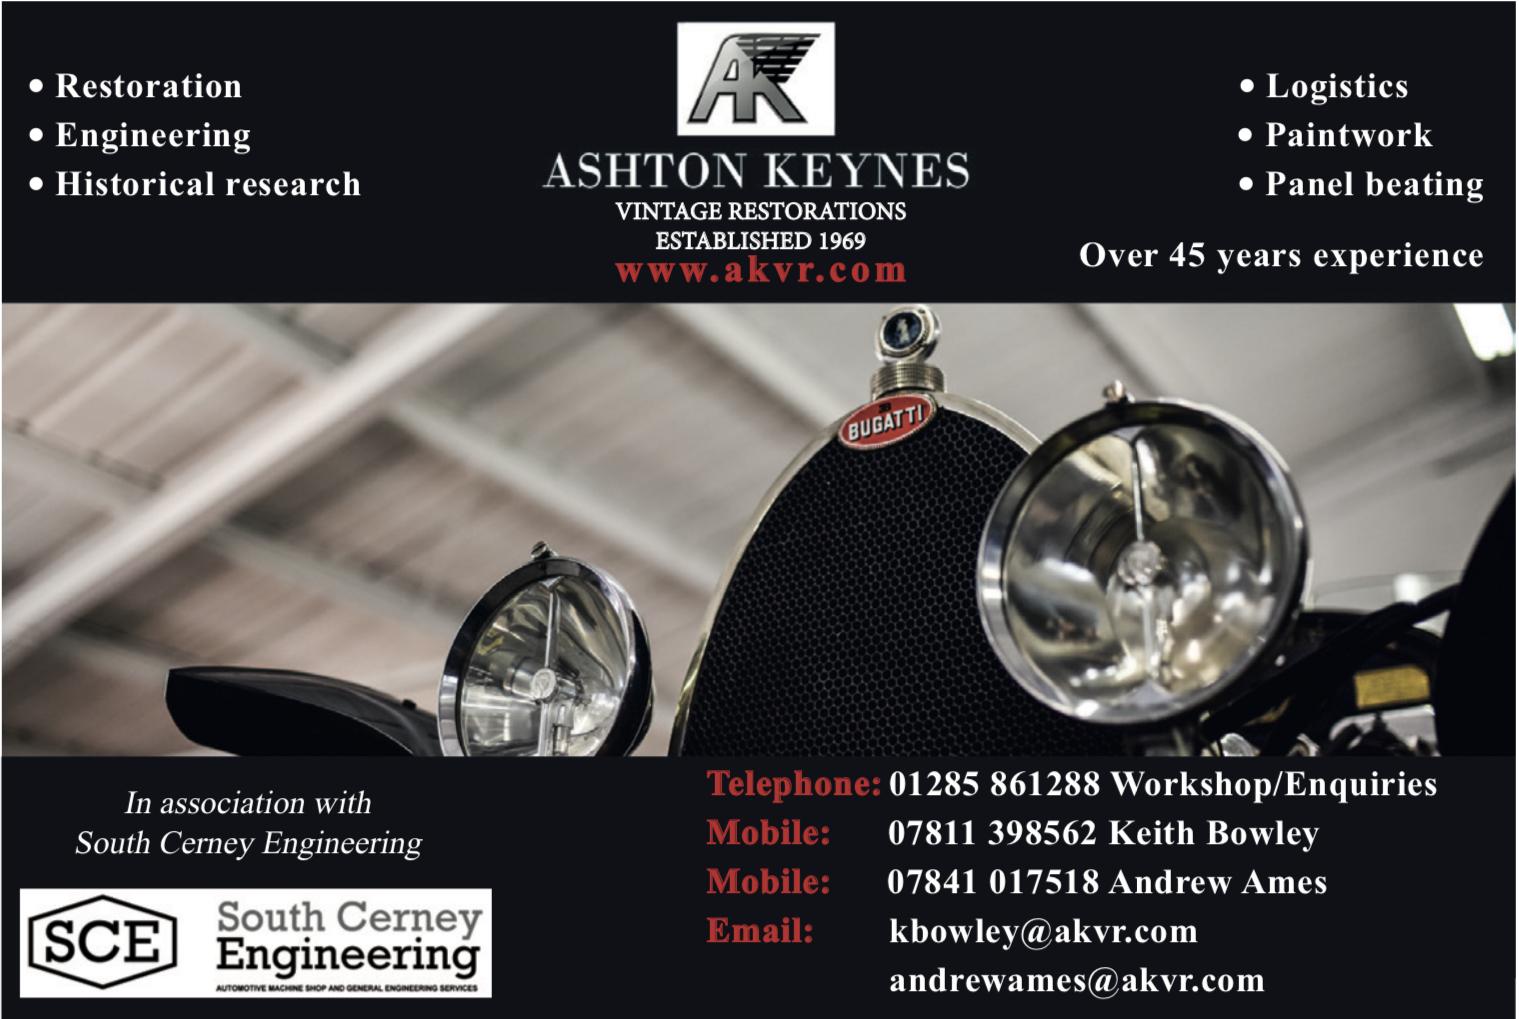 Ashton Keynes Vintage Restorations - Classic cars and Vintage Restorations engineering and historical research